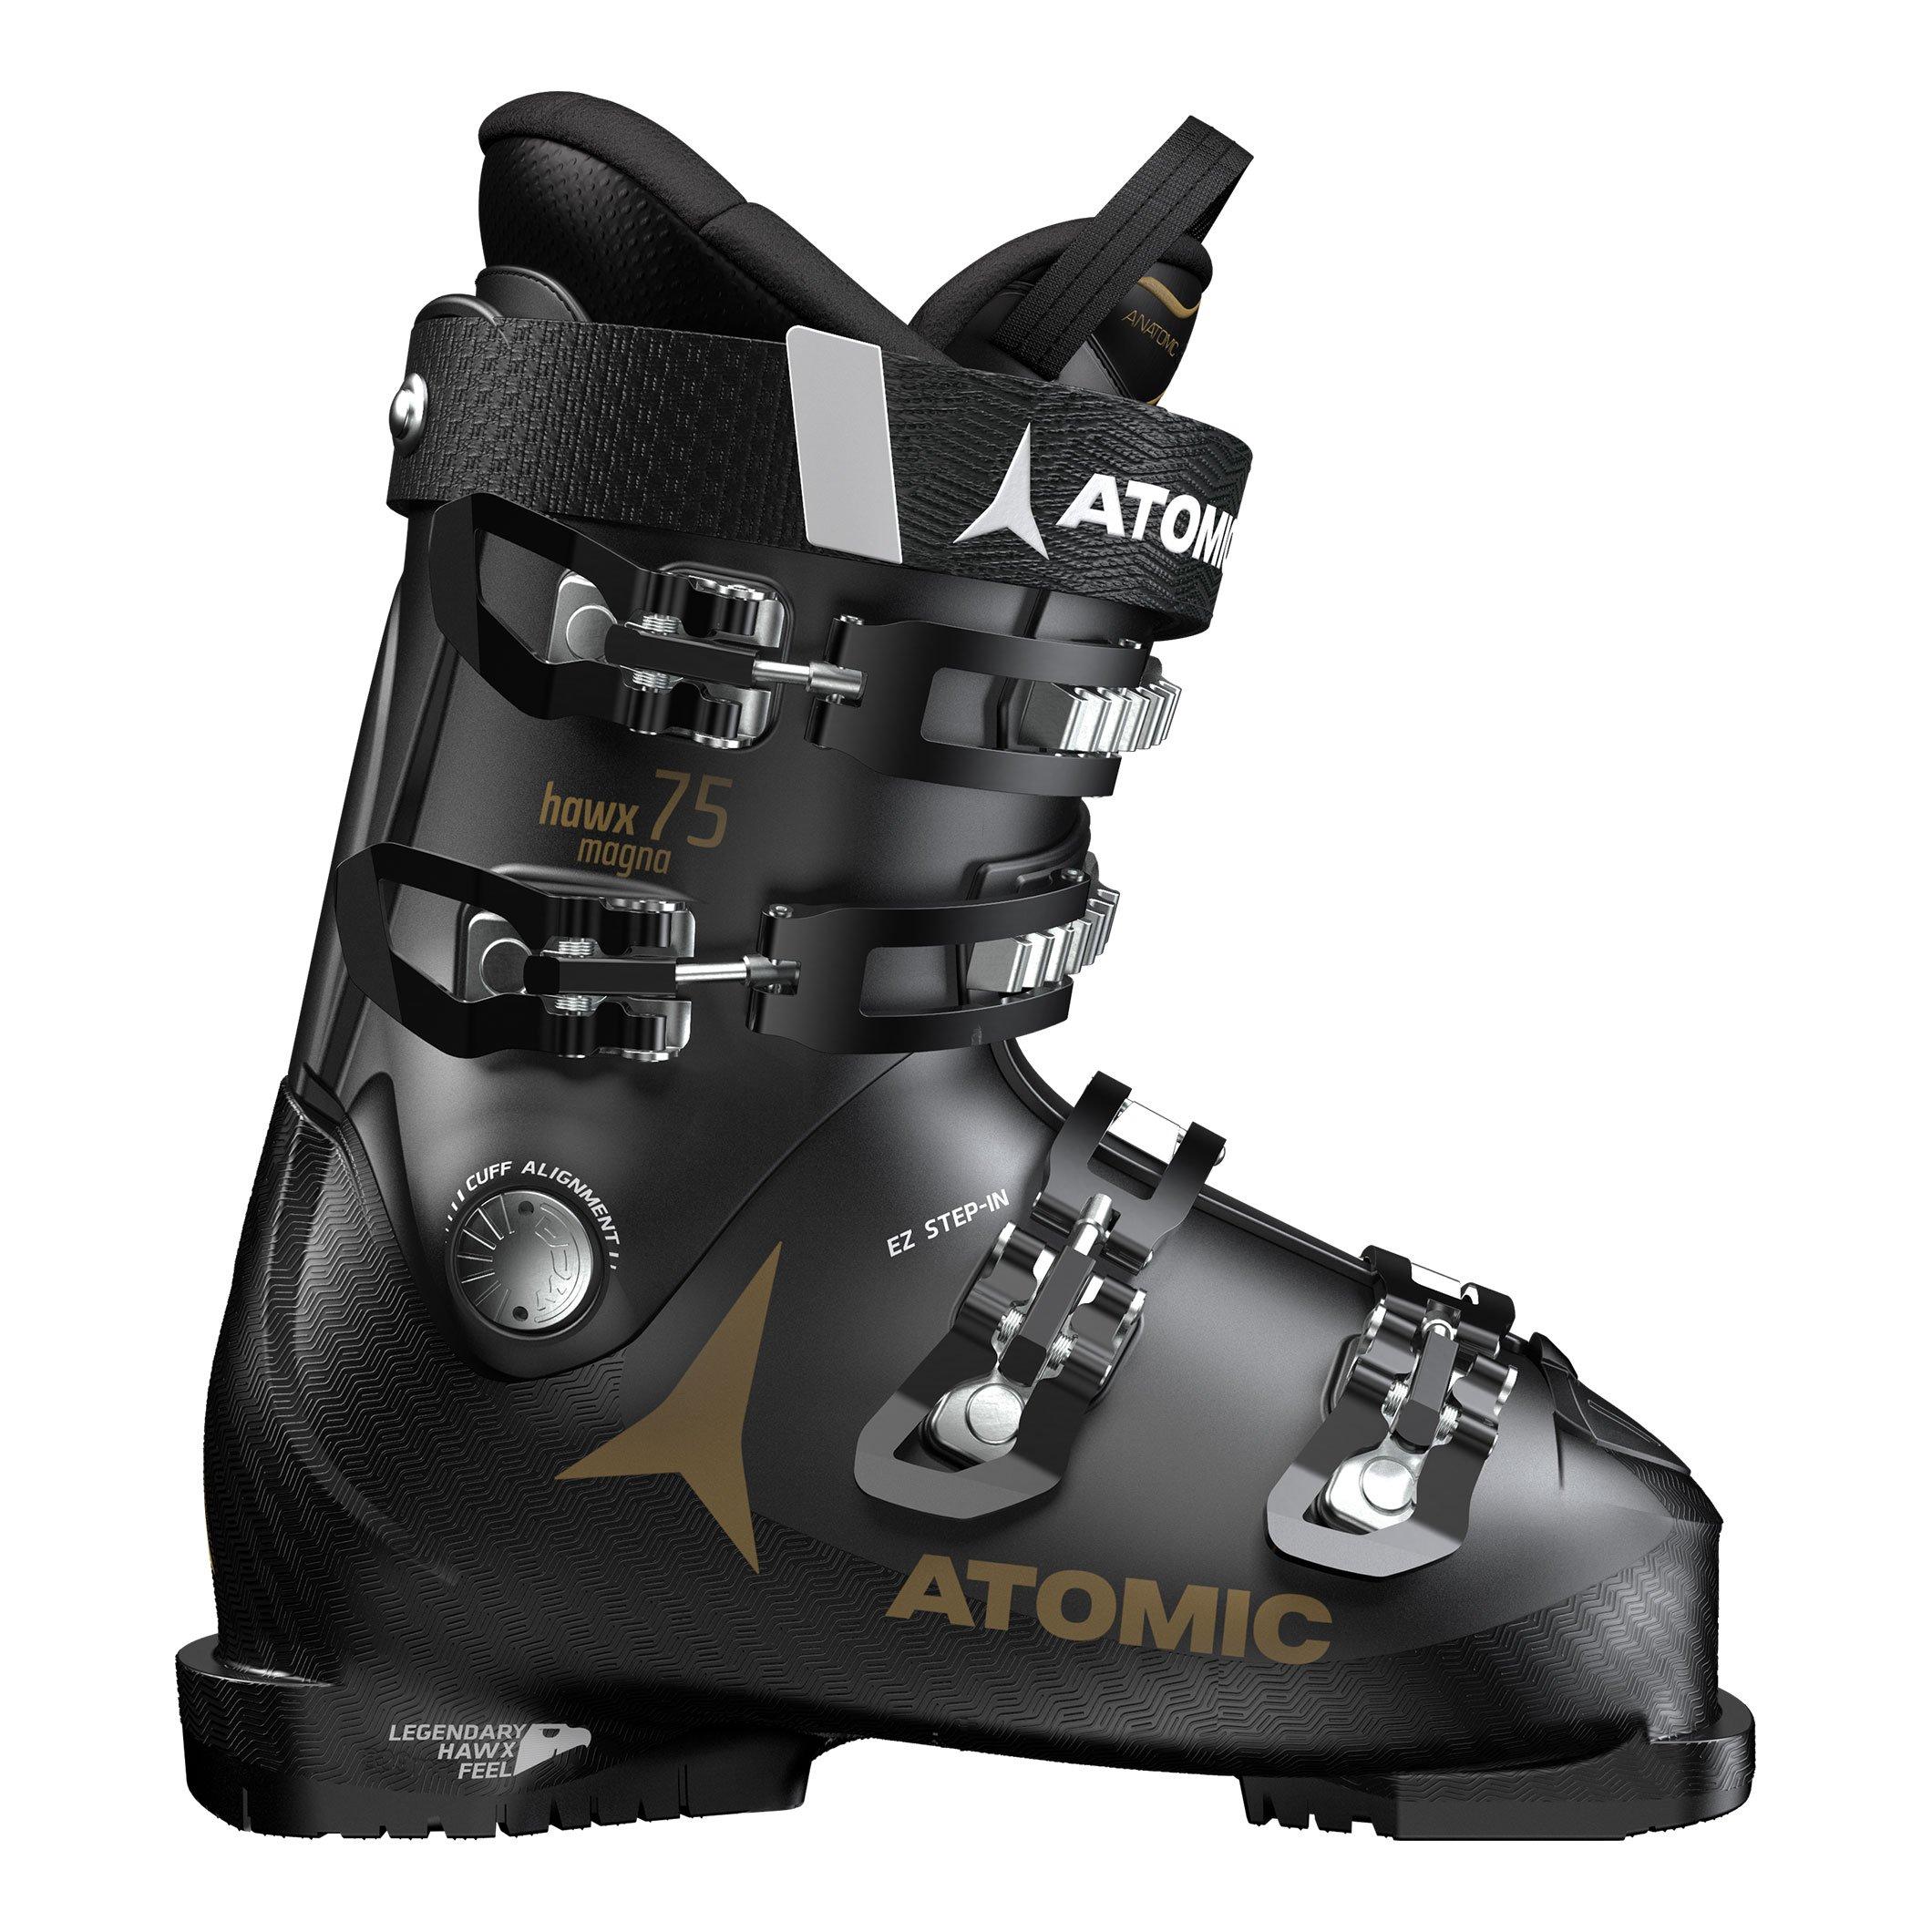 Sjezdové boty Salomon X Access 60 wide W L39947600 18 19 - Actisport.cz 945e505e38